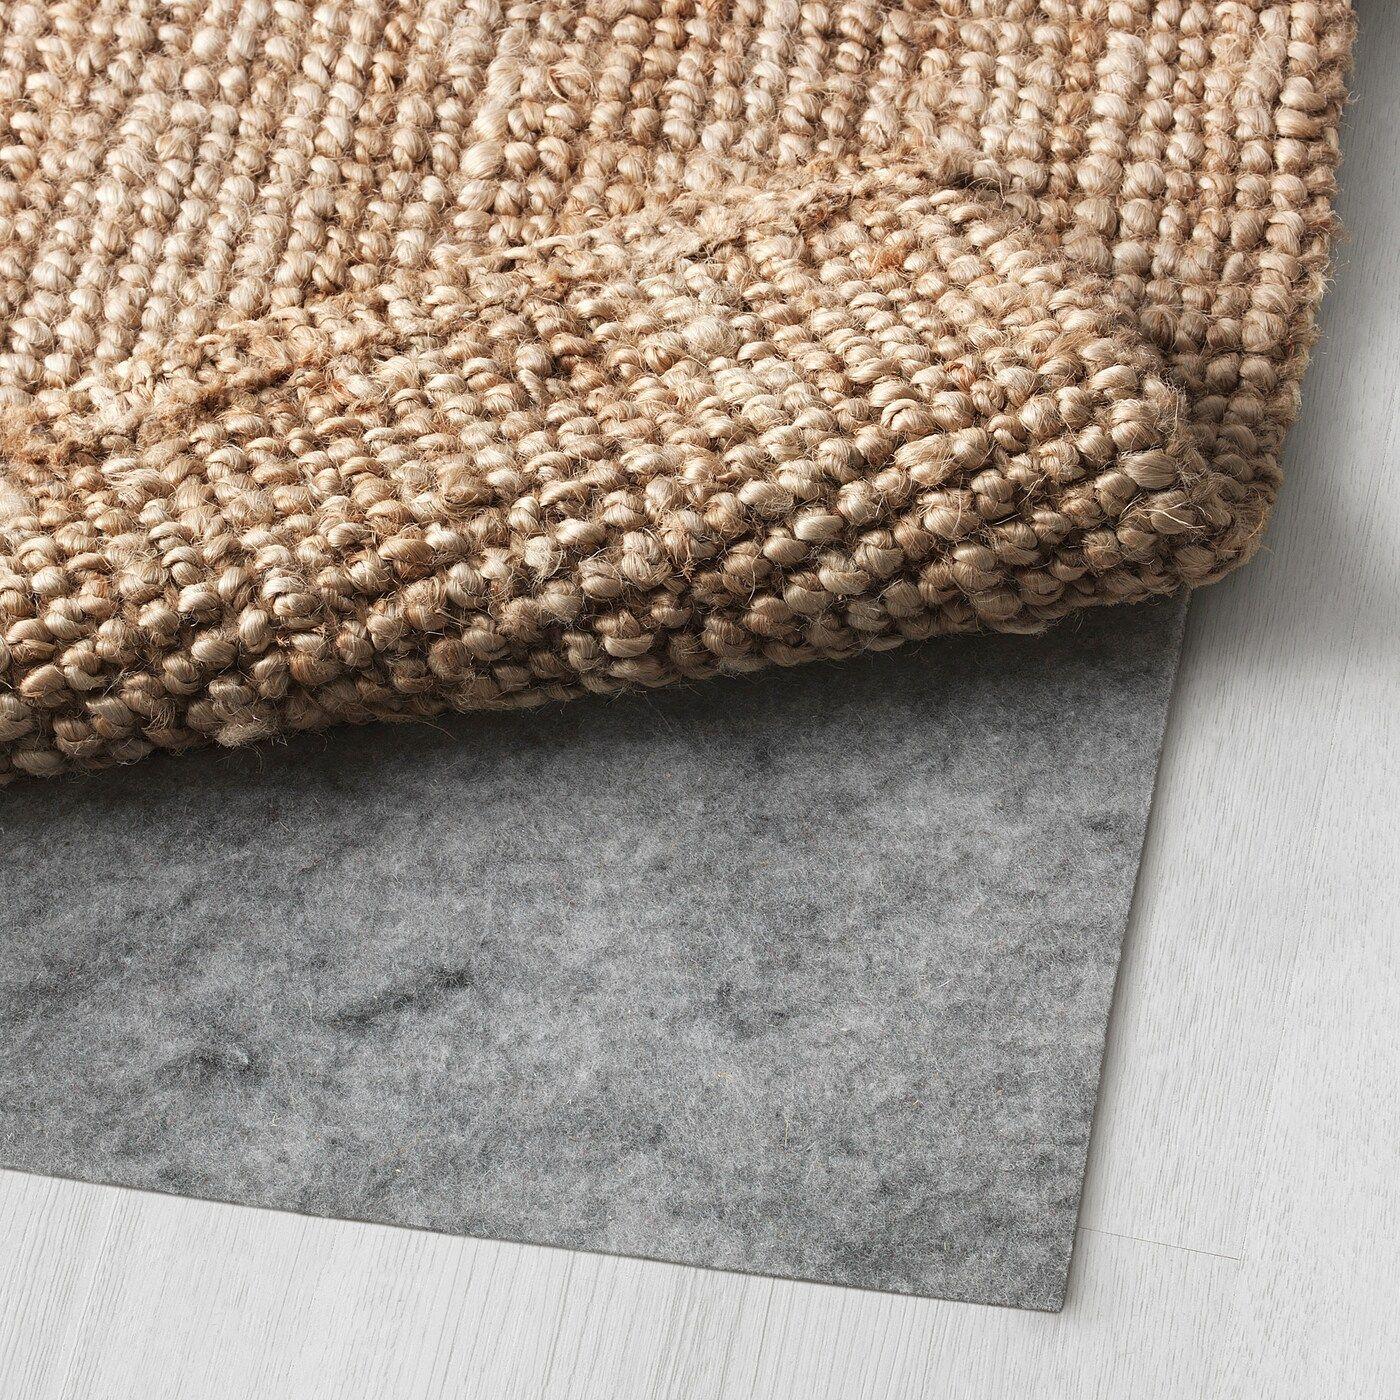 Lohals Rug Flatwoven Natural Find It Here Ikea In 2020 Lohals Teppich Flach Gewebt Teppich